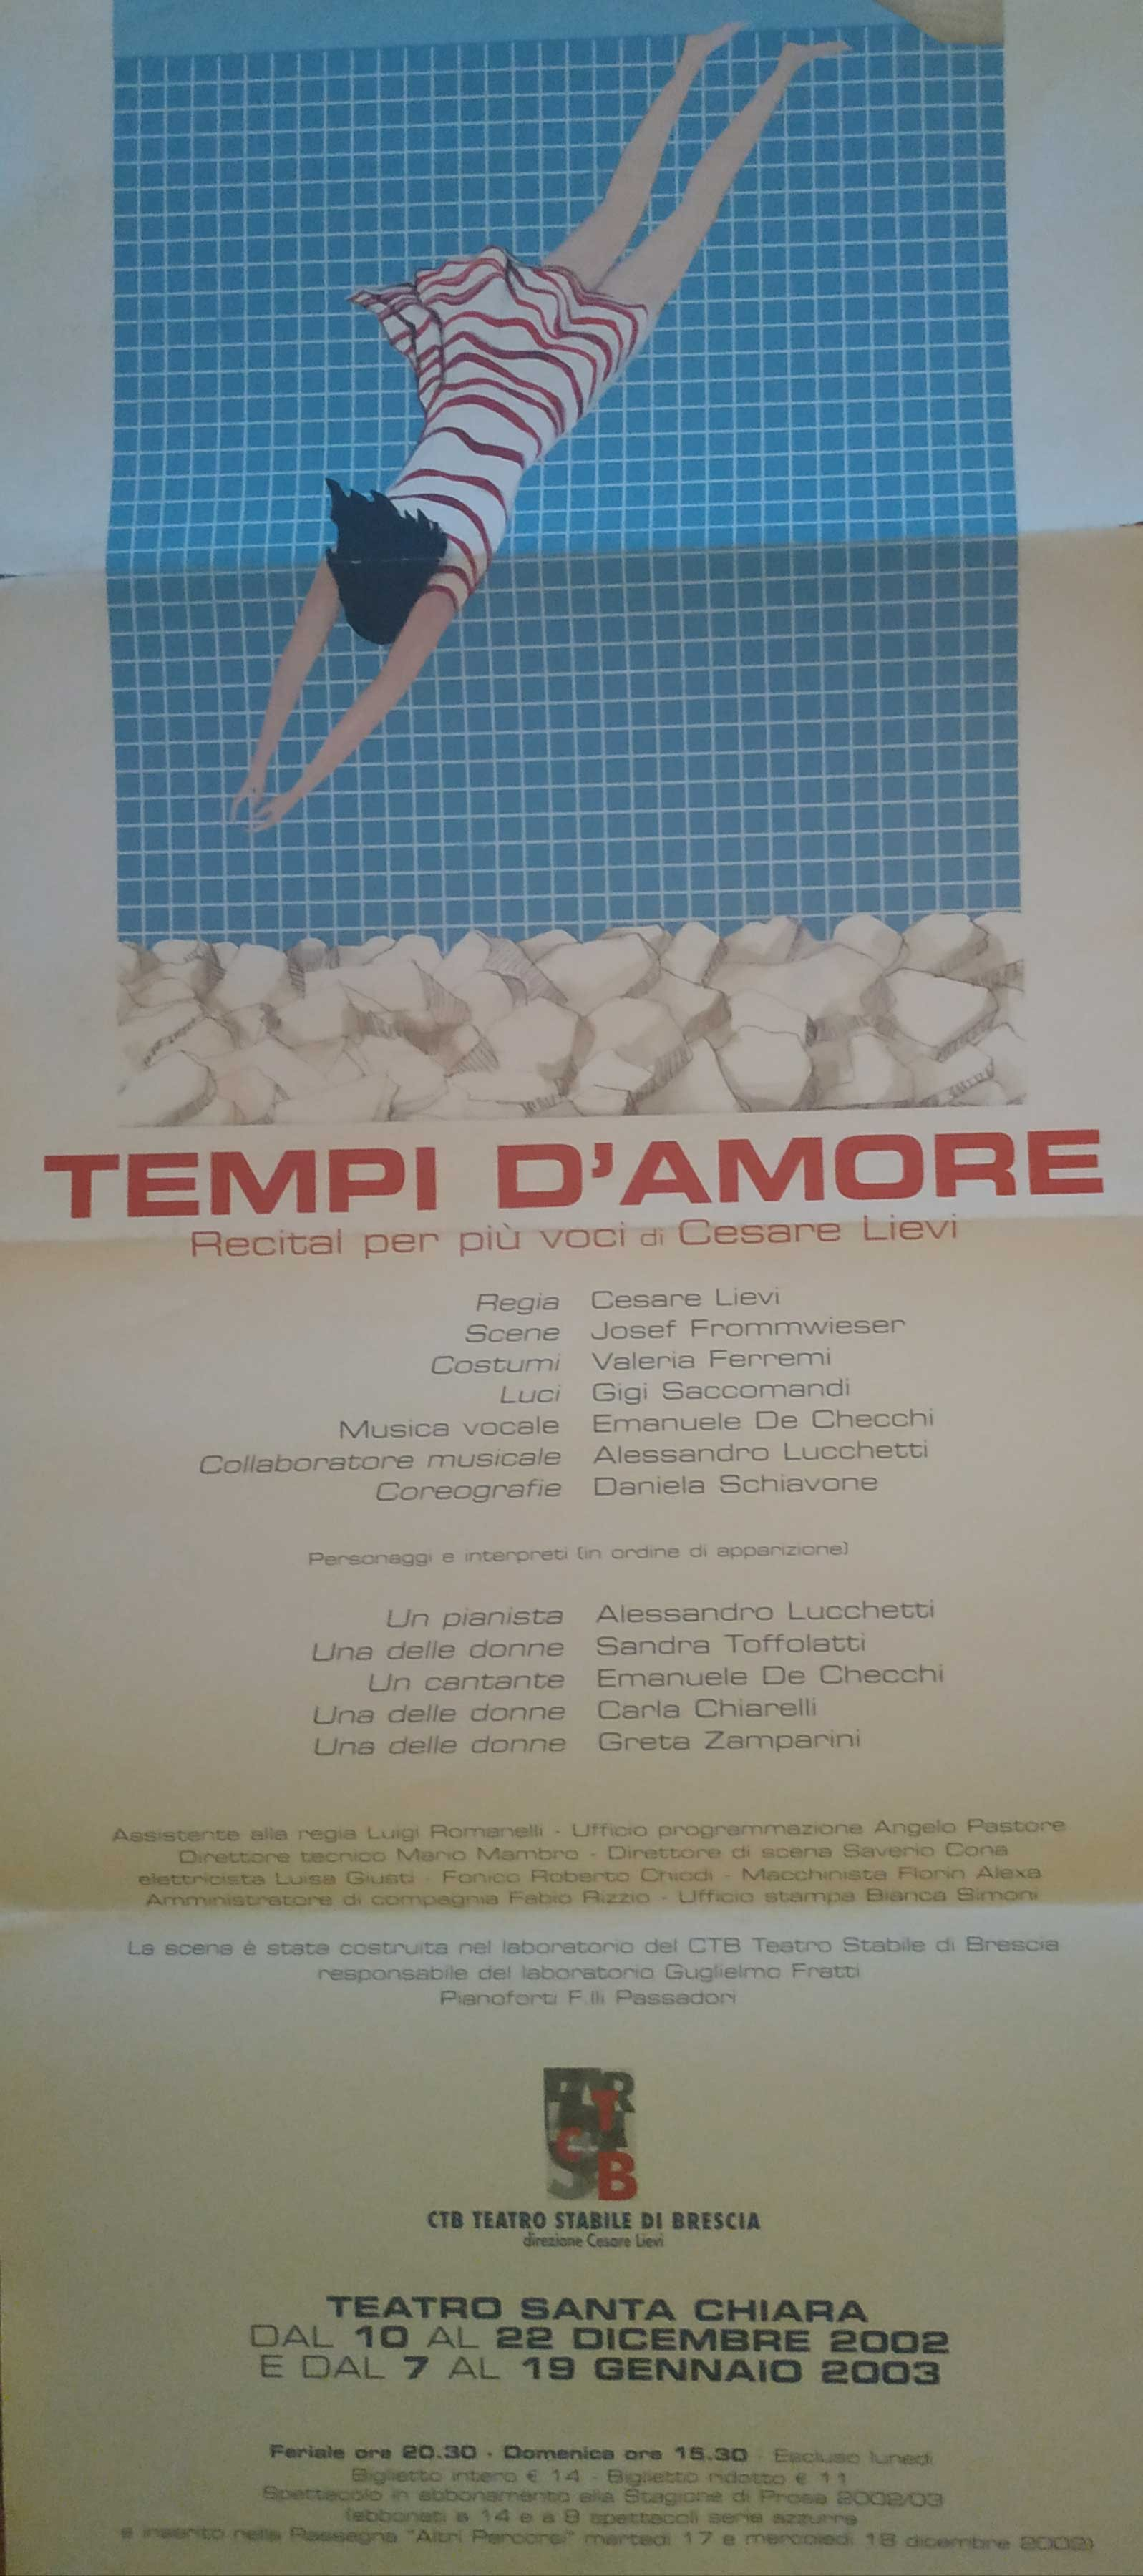 TEMPI D'AMORE by Cesare Lievi